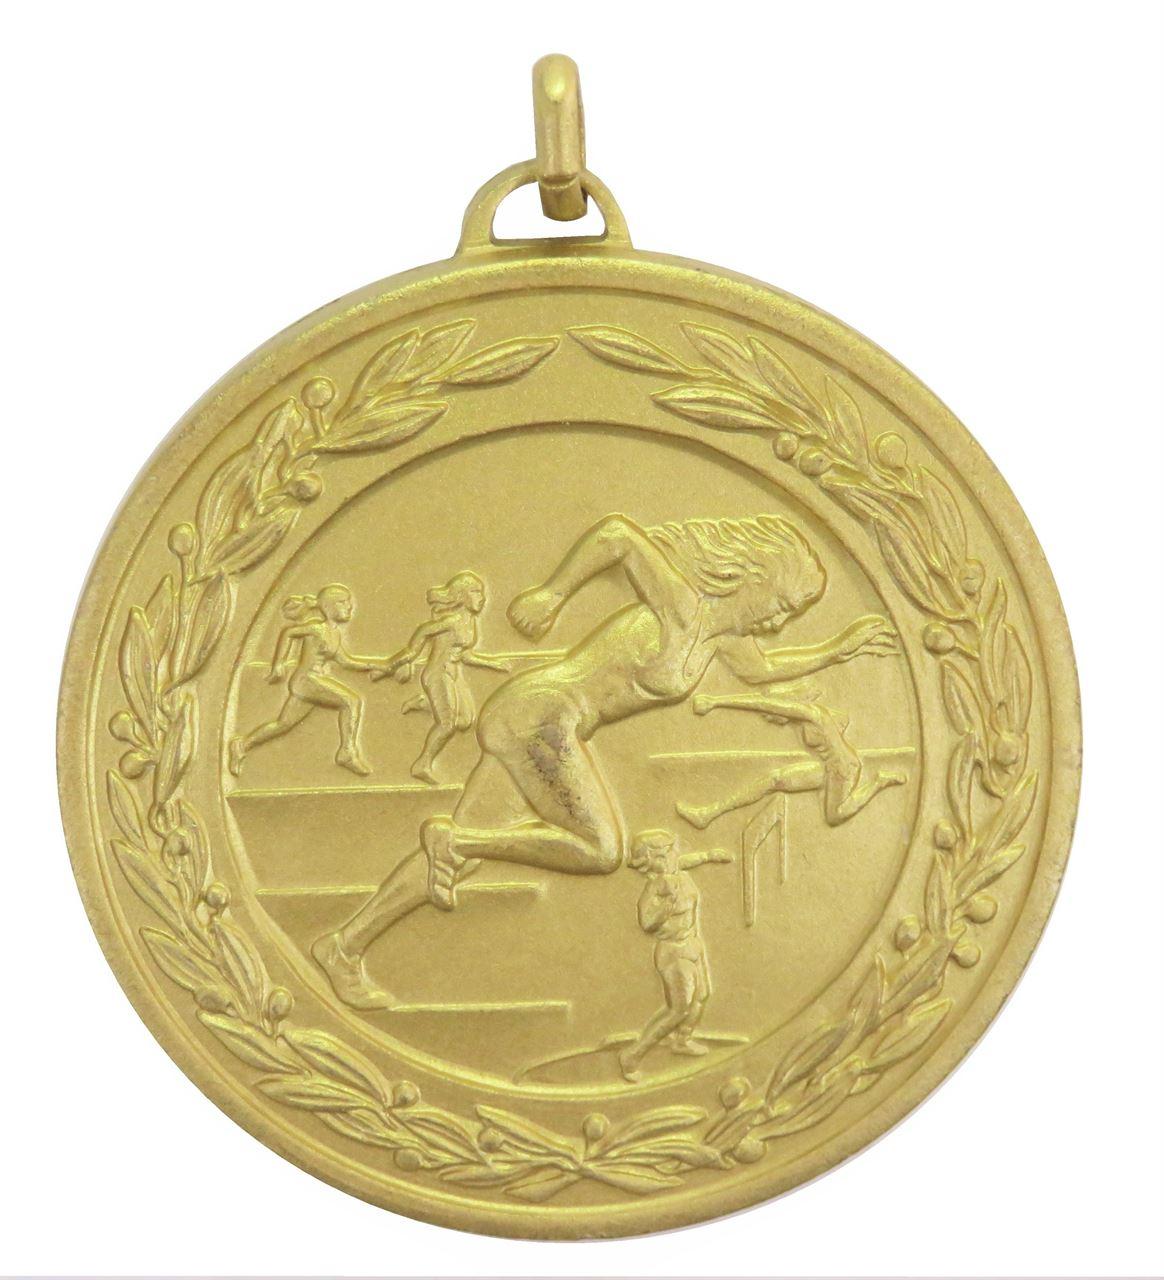 Gold Laurel Economy Female Track & Field Medal (size: 50mm) - 9683E